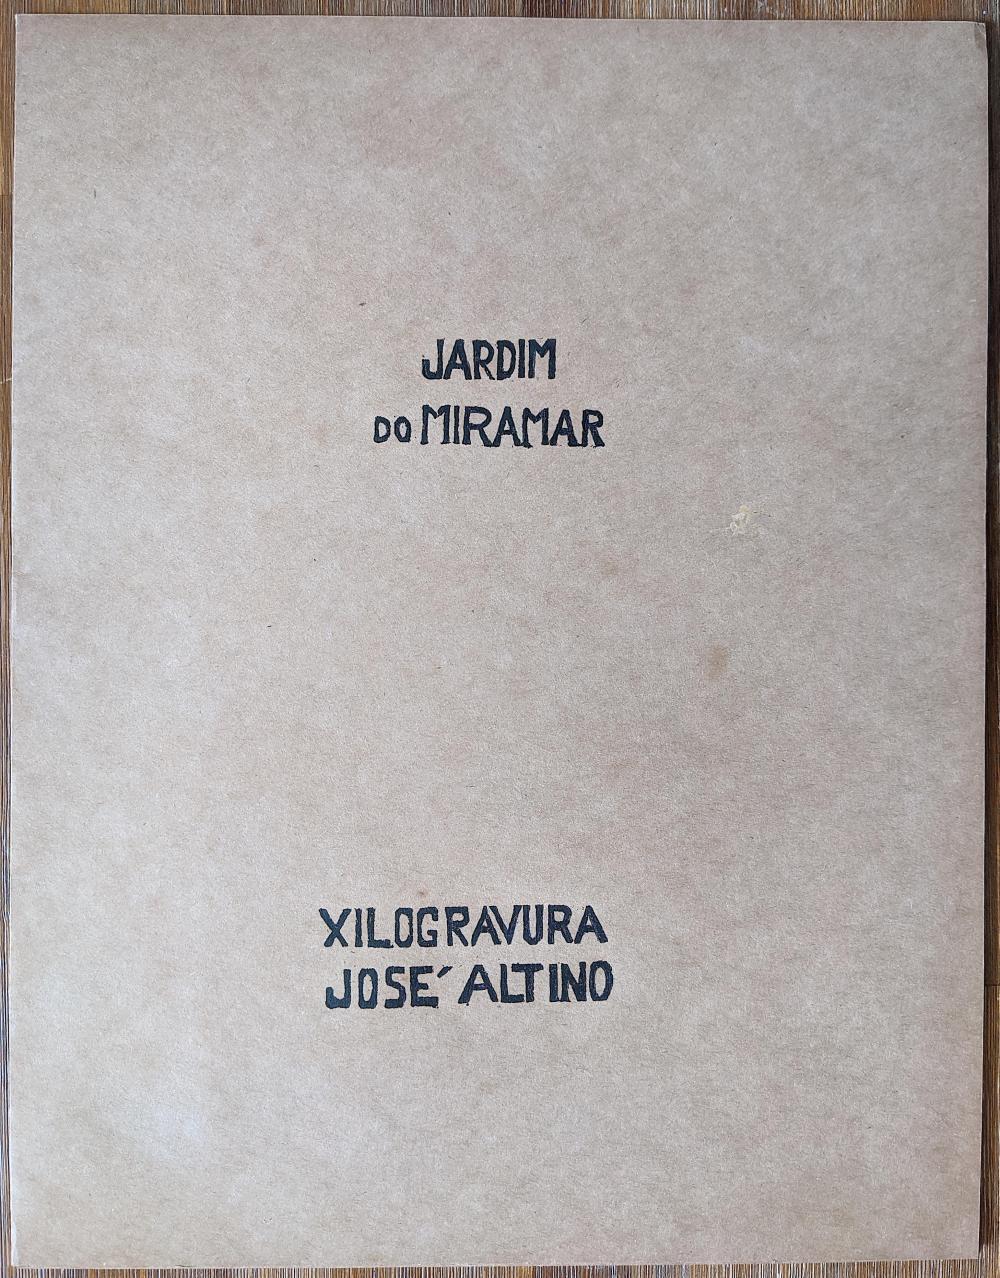 JOSE ALTINO Brasil L. Edit. Xilogravure 10/30, Signed